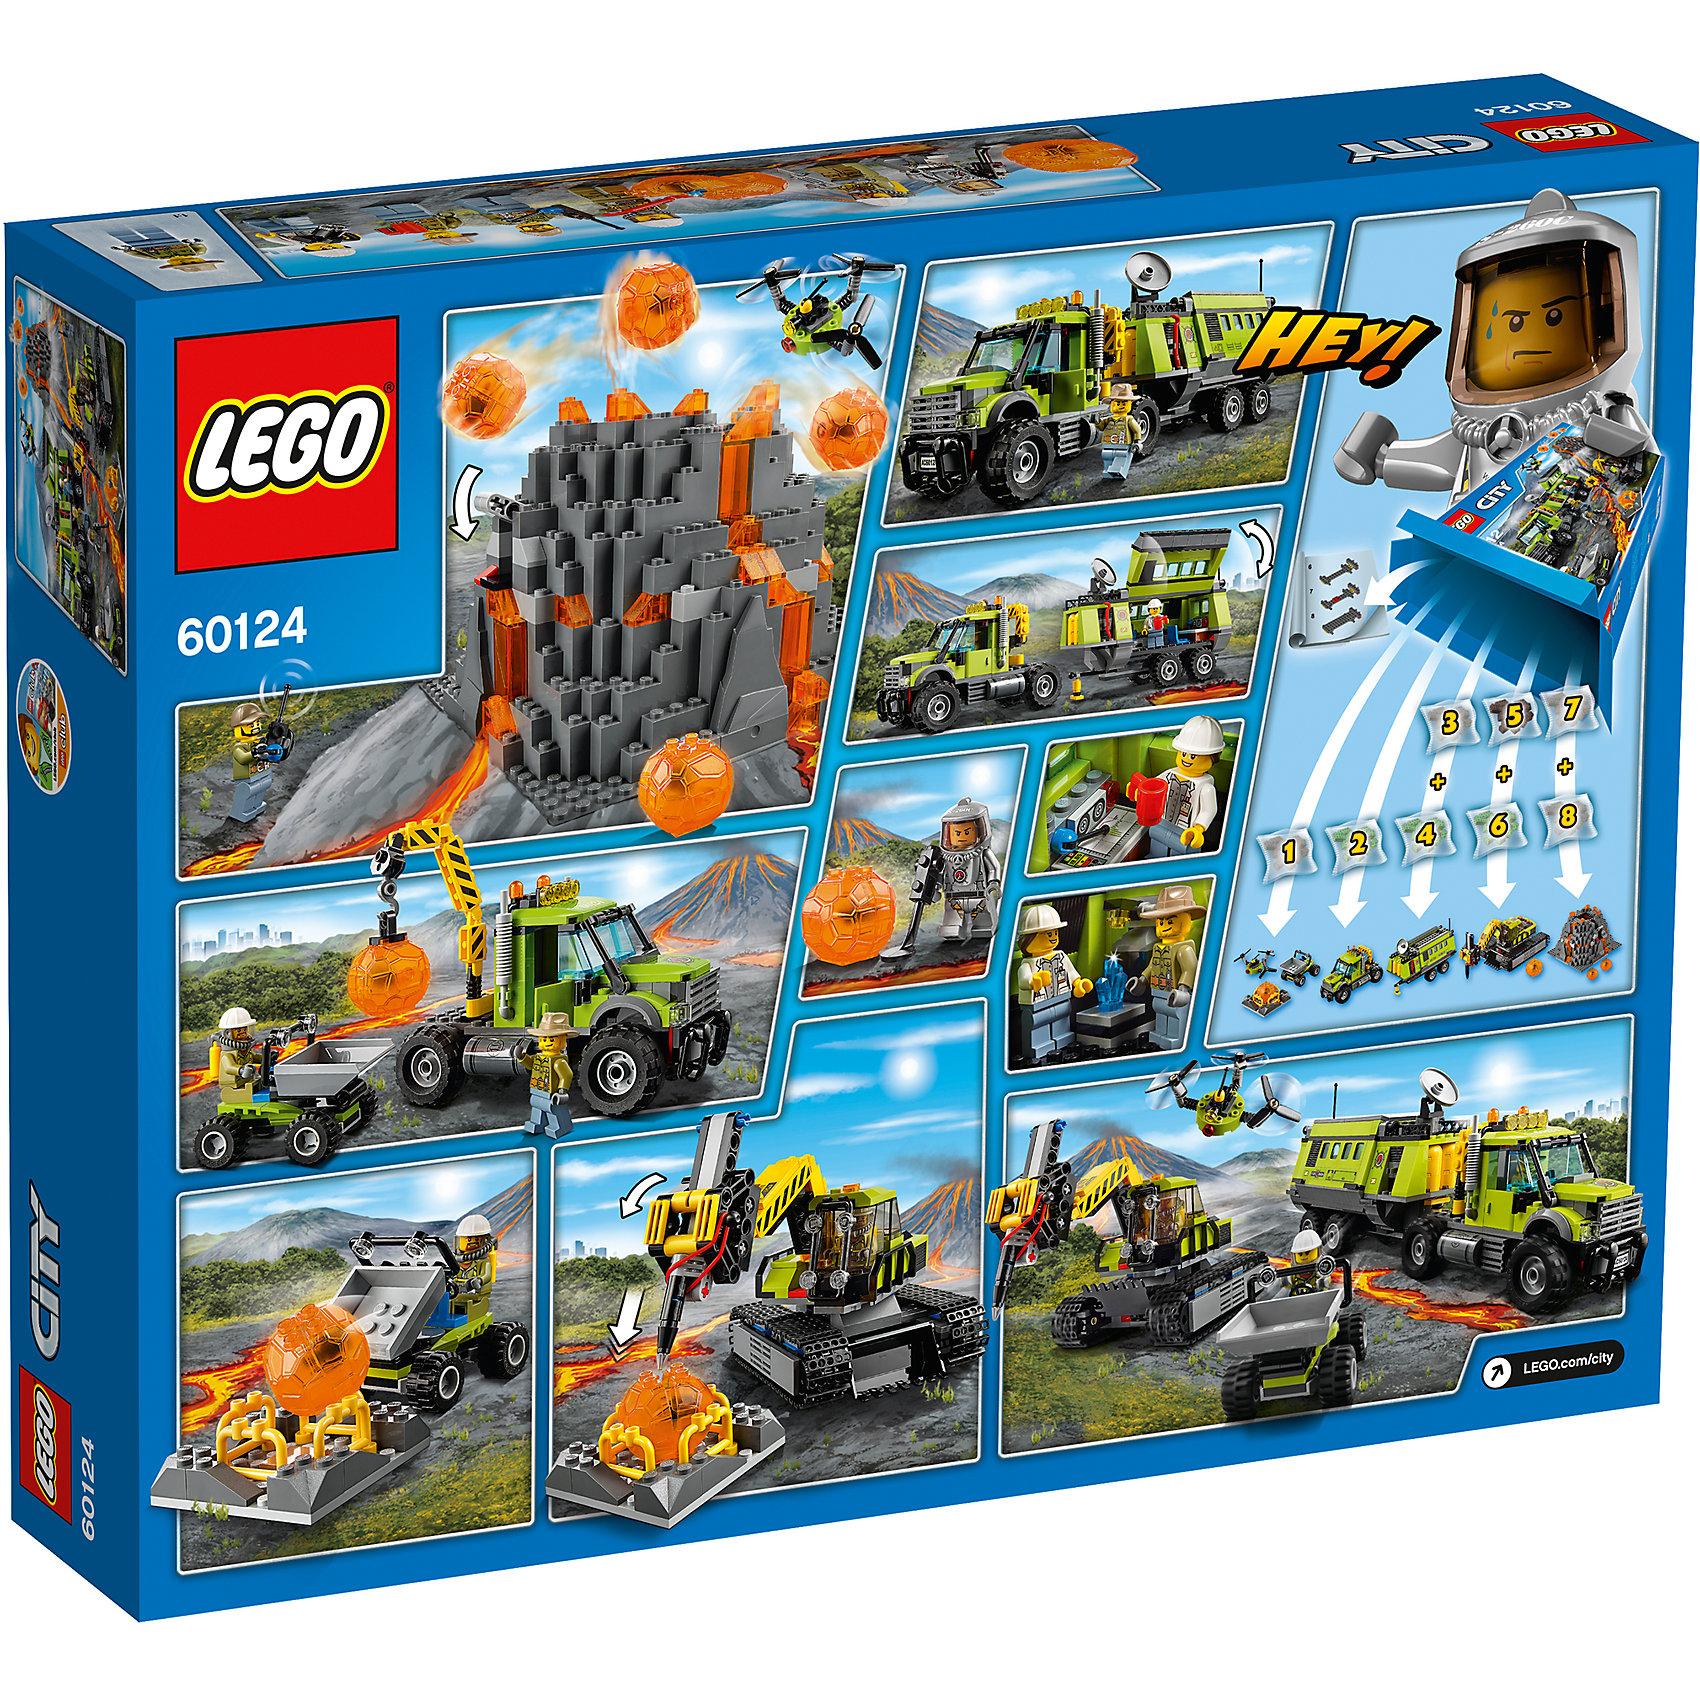 LEGO City 60124: База исследователей вулканов от myToys